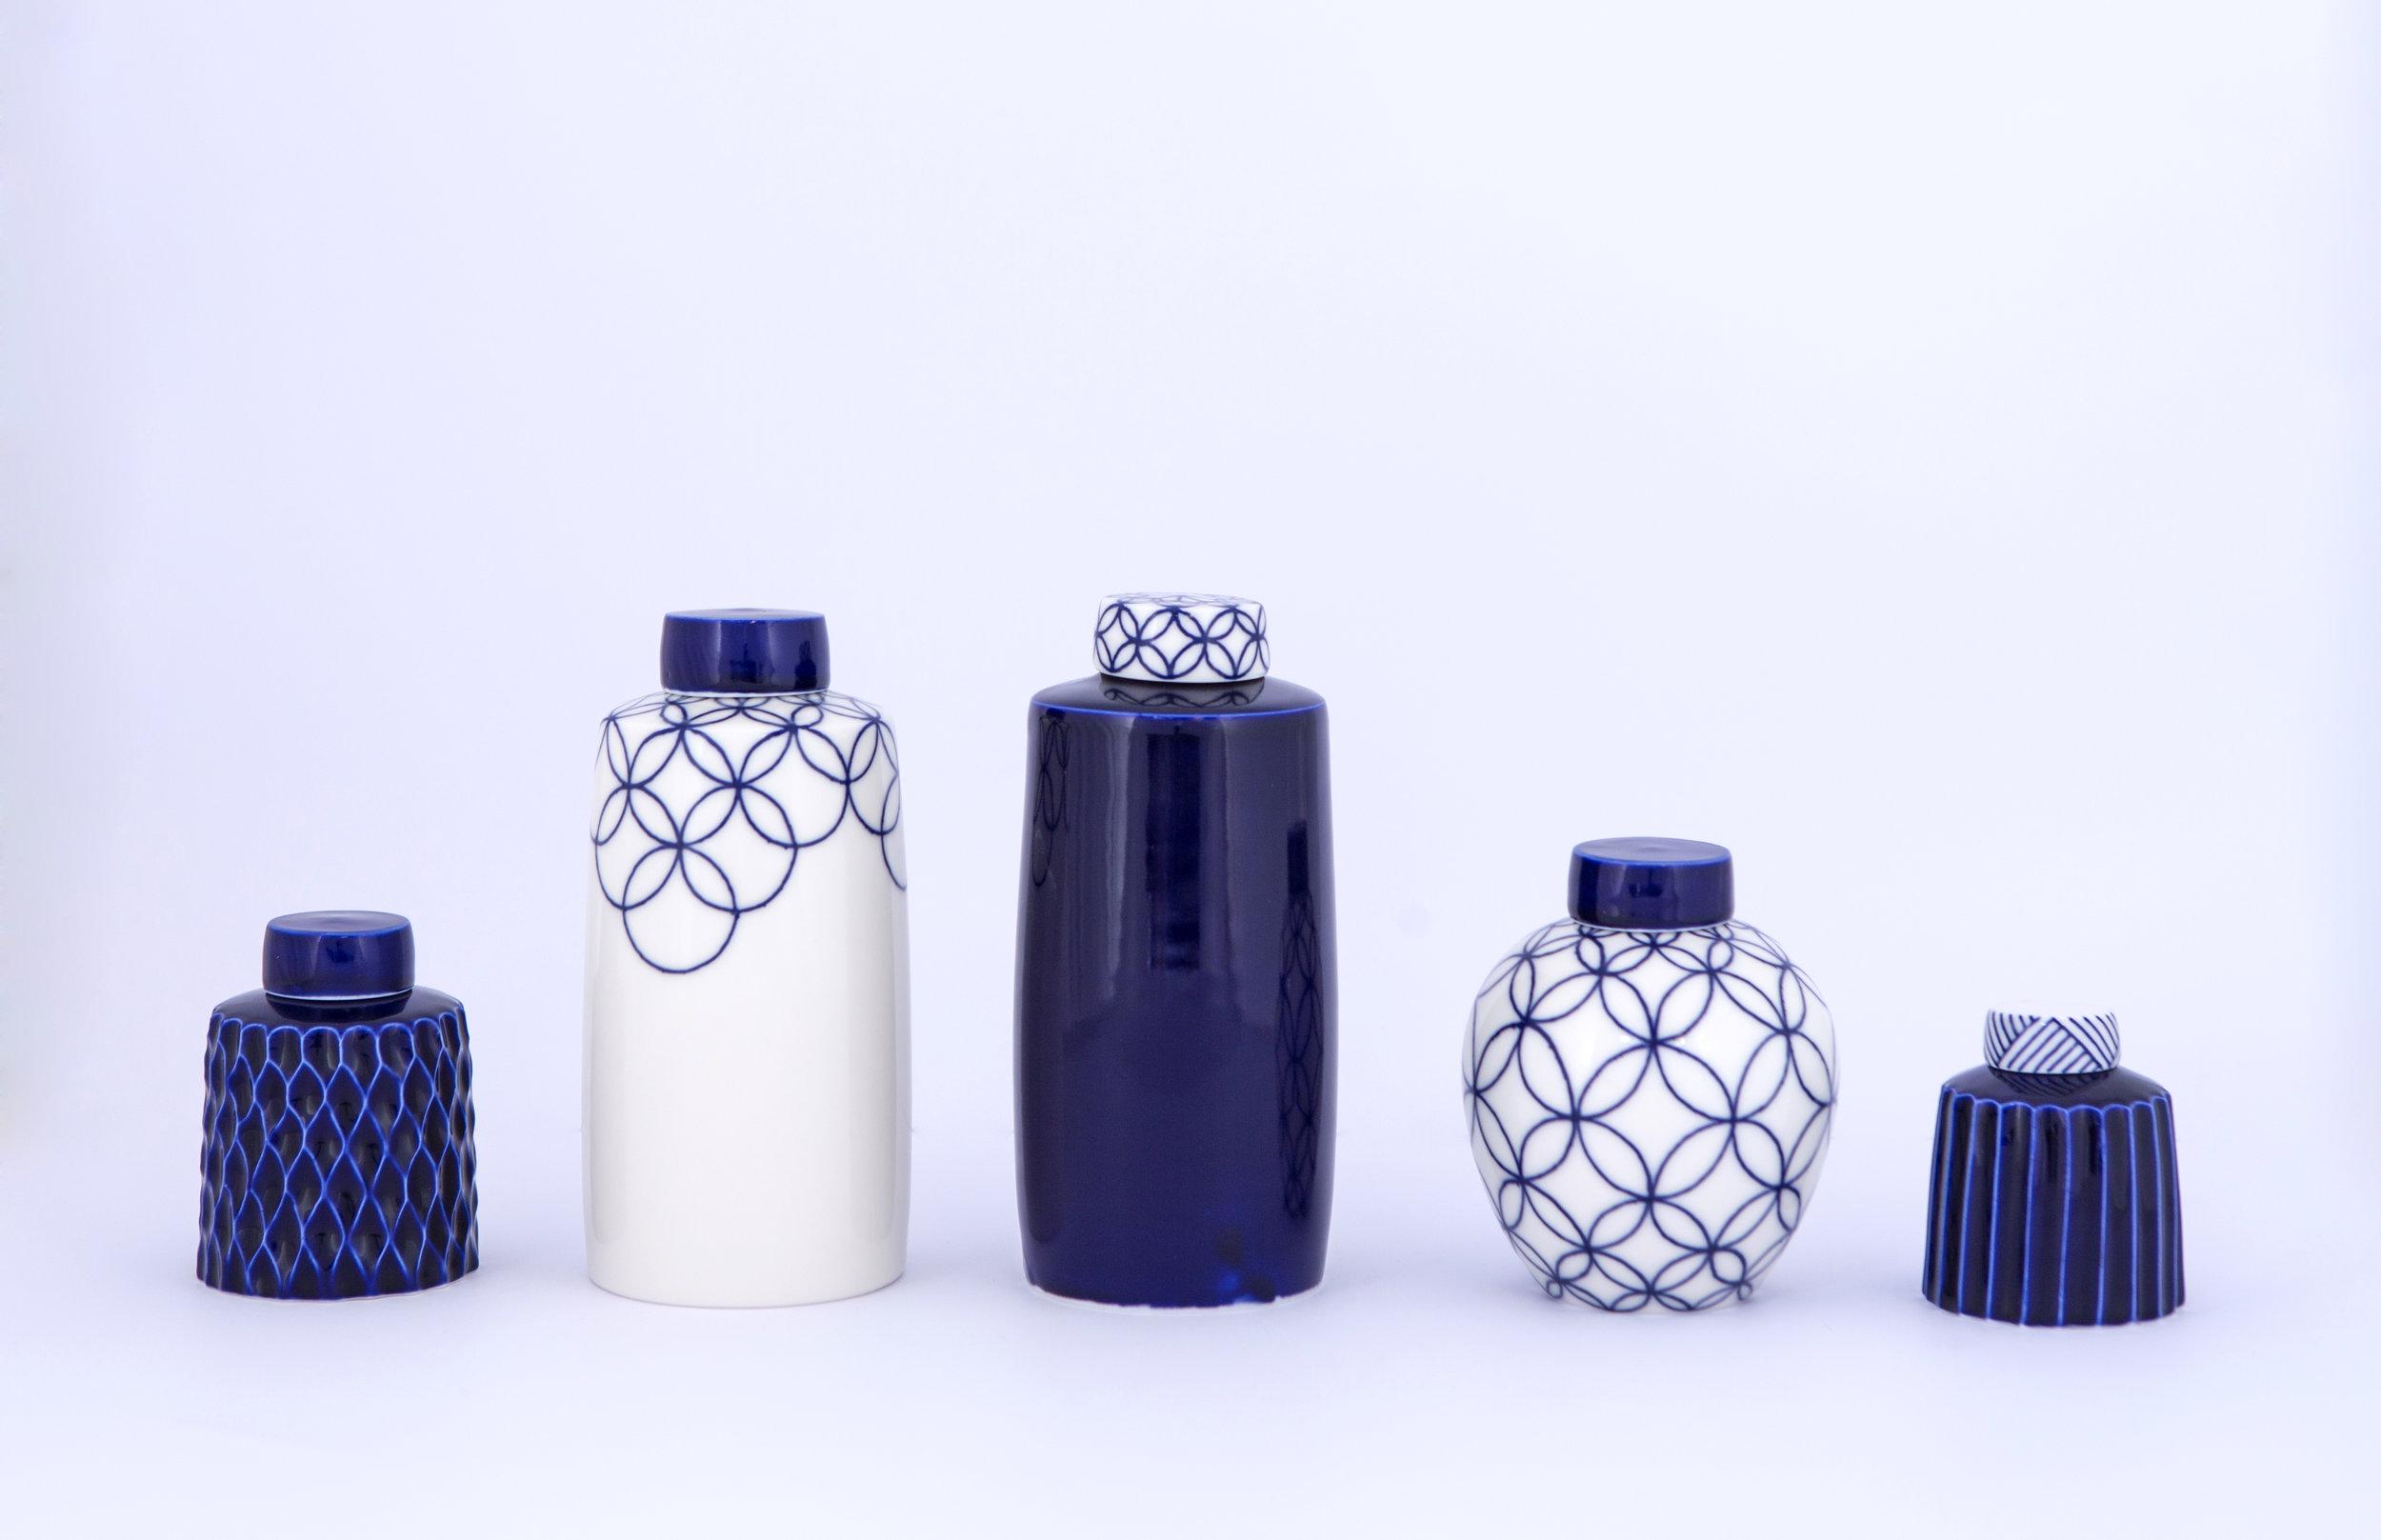 2 Rhian Malin Ceramics 6 ginger Jars, Photo by Lucy Barriball.jpg